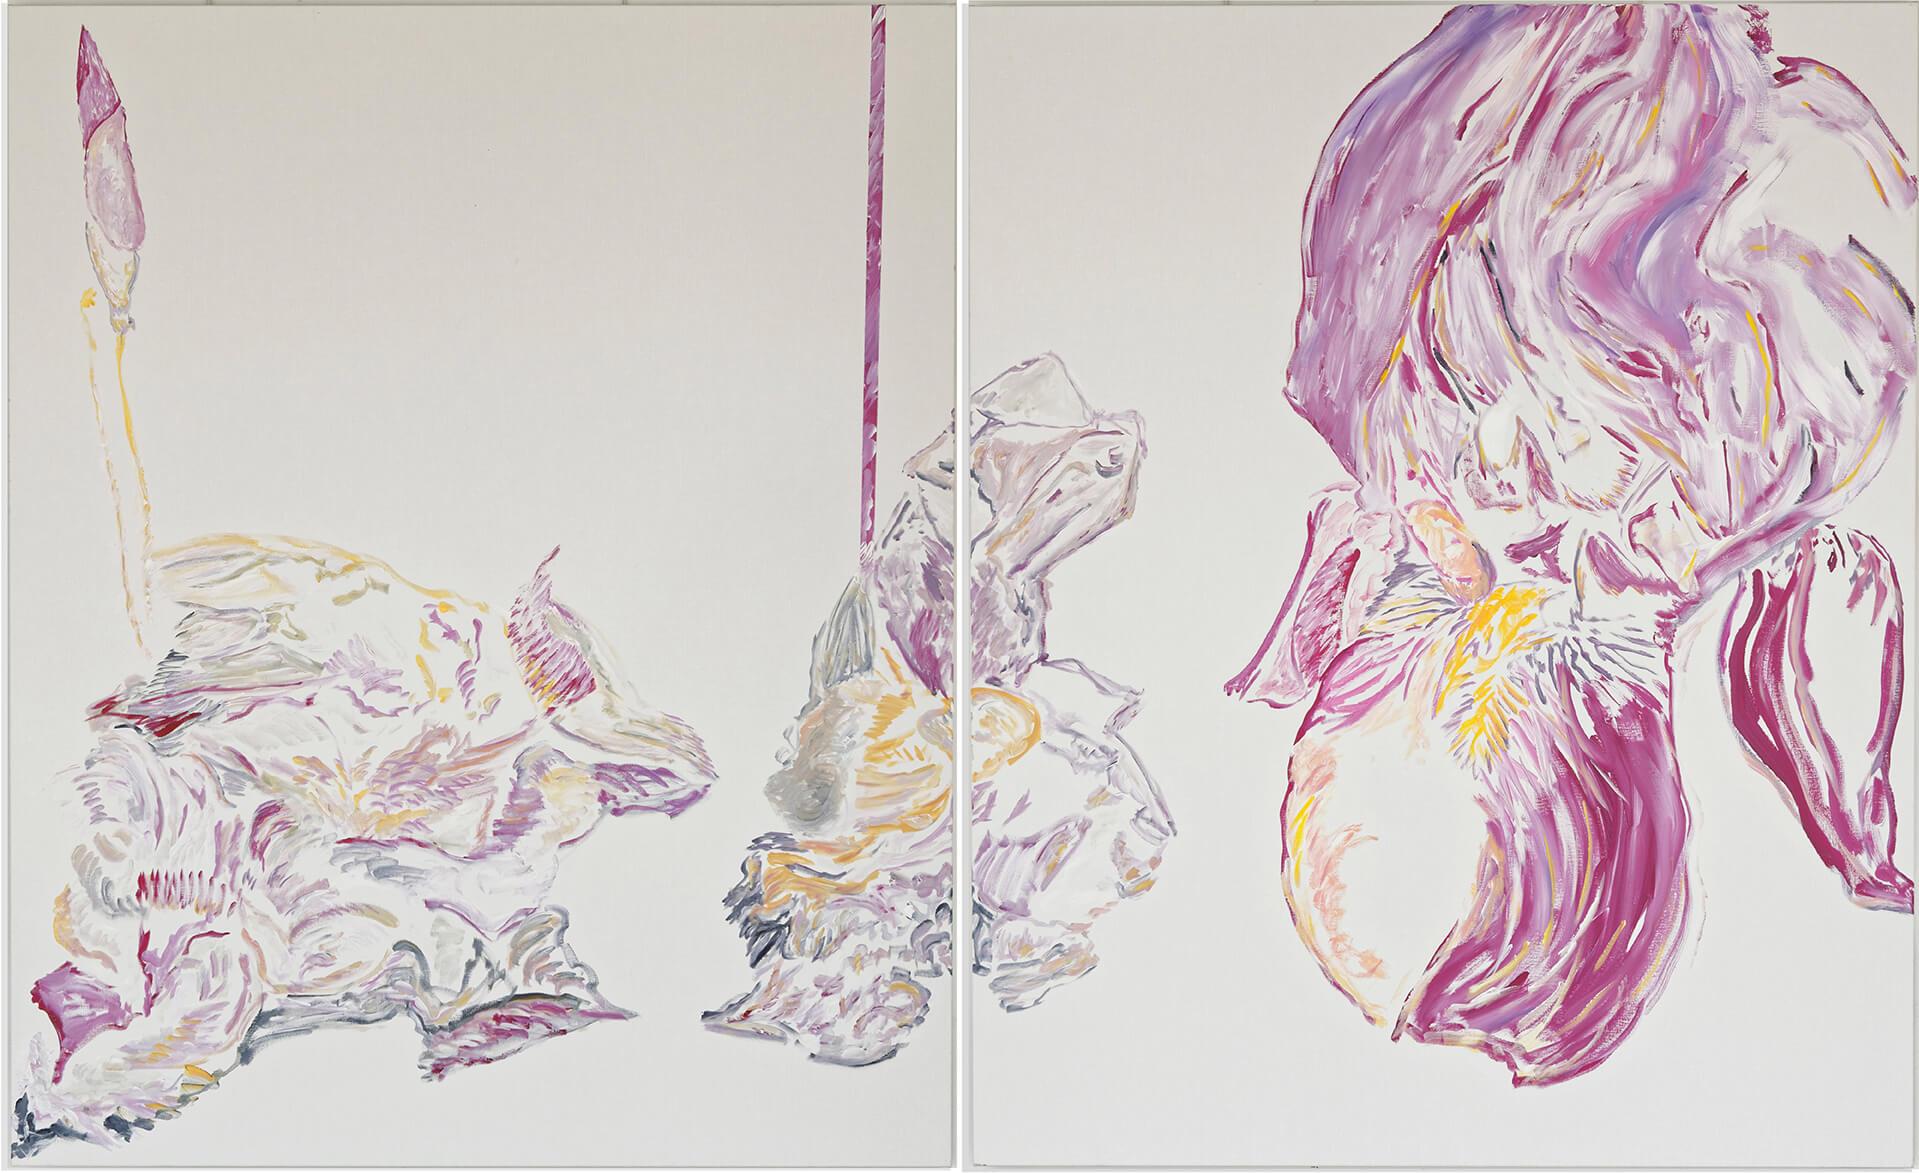 L'iris (gauche/droit) de Varozza (acrylic and mixed media, - diptych 160 x 130 cm (x 2) - 2015)